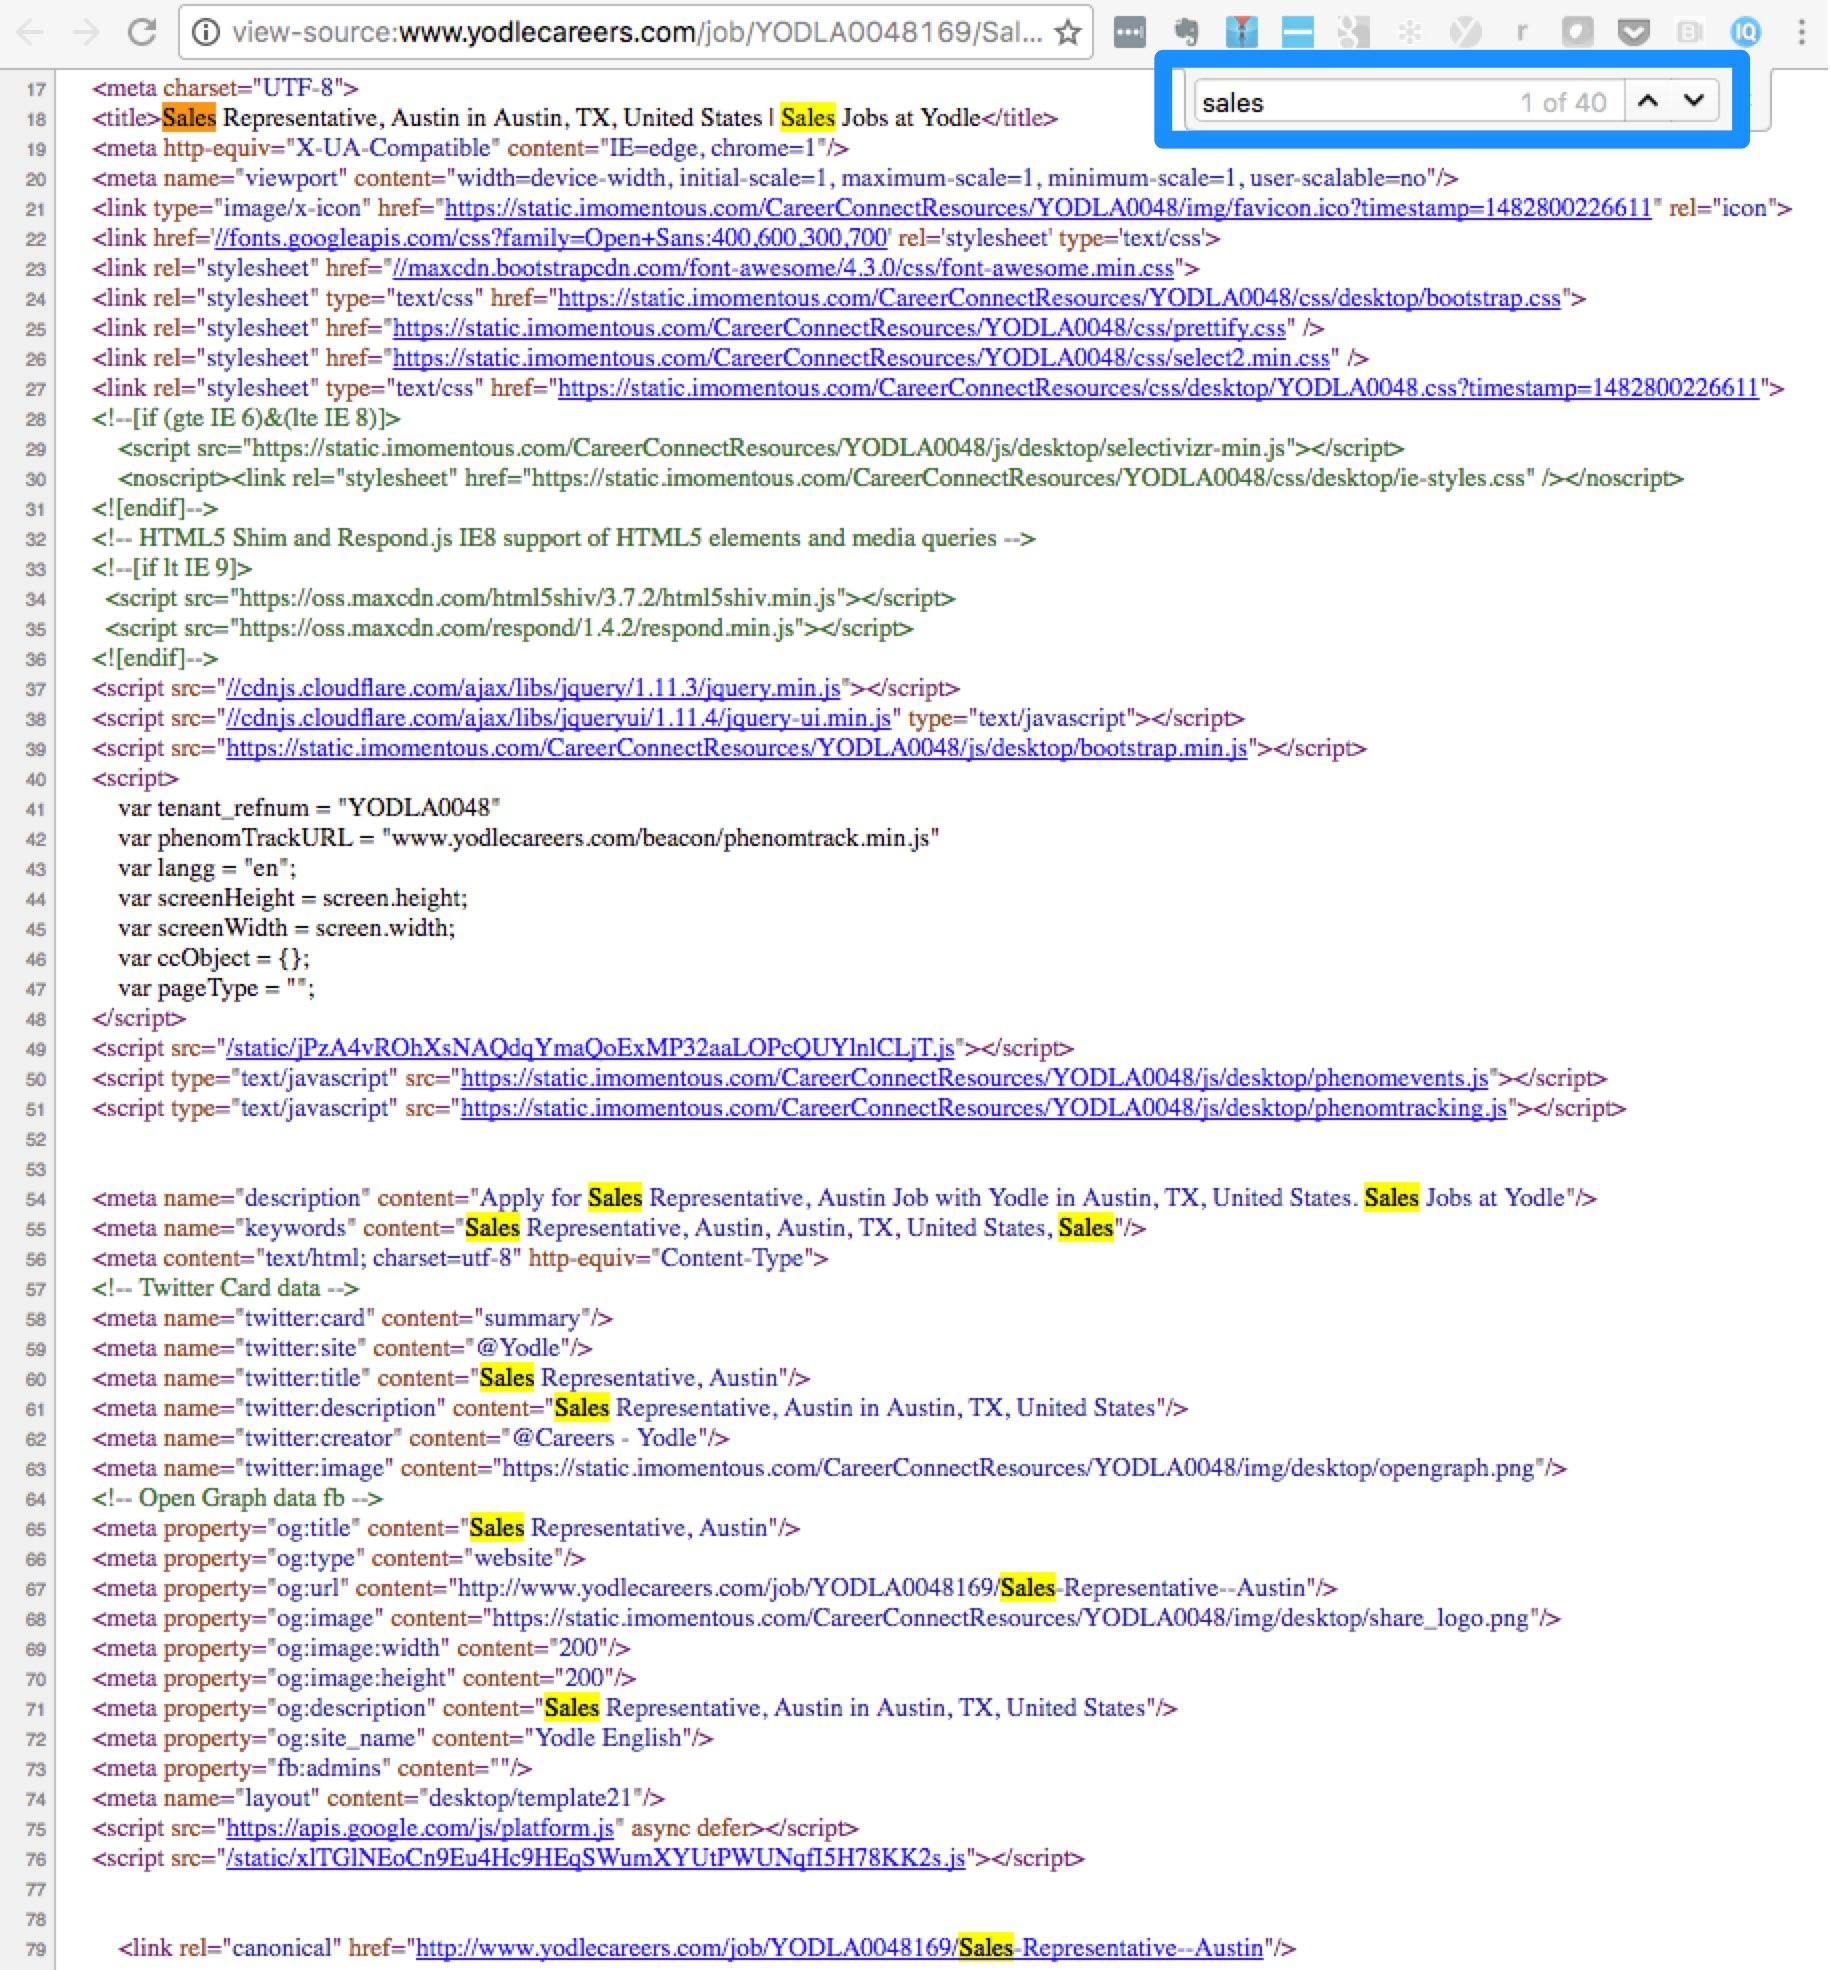 recruitment-seo-keyword-density-yodlee-job-description-ongig-blog